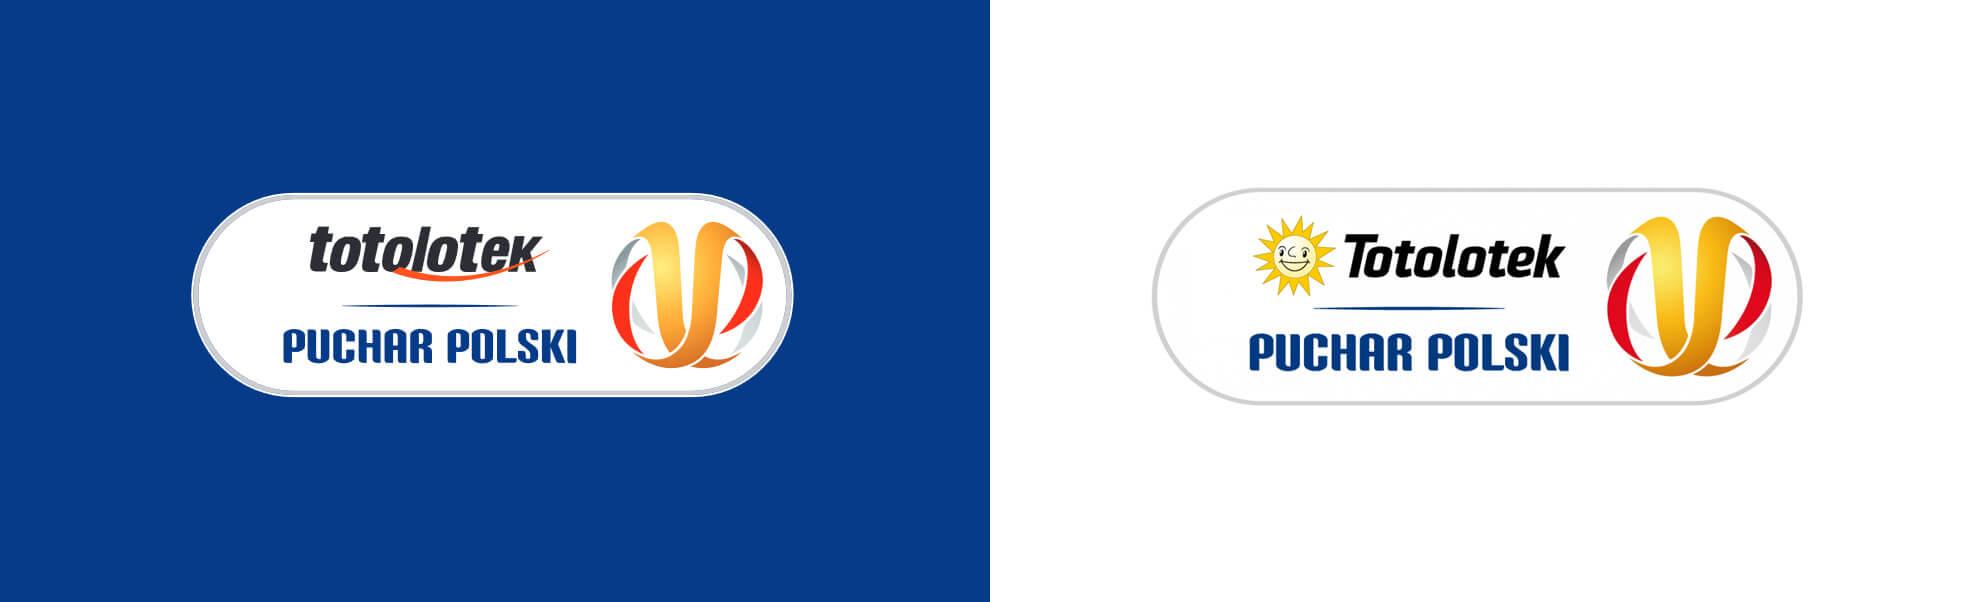 totolotek puchar polski zmienił logo